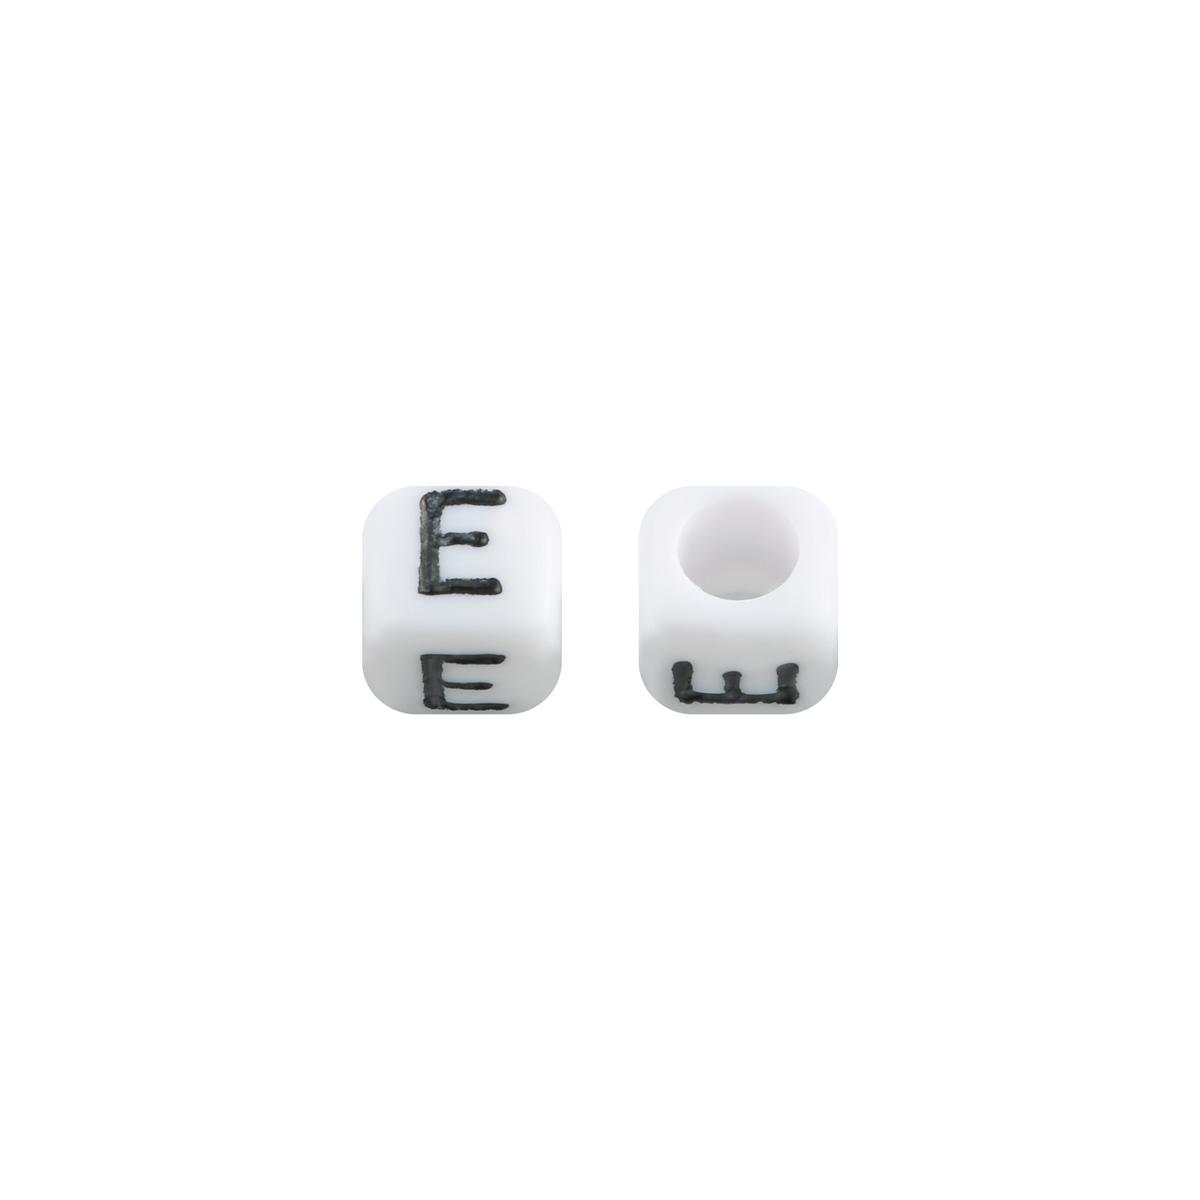 Cuentas DIY Letter E - 6MM